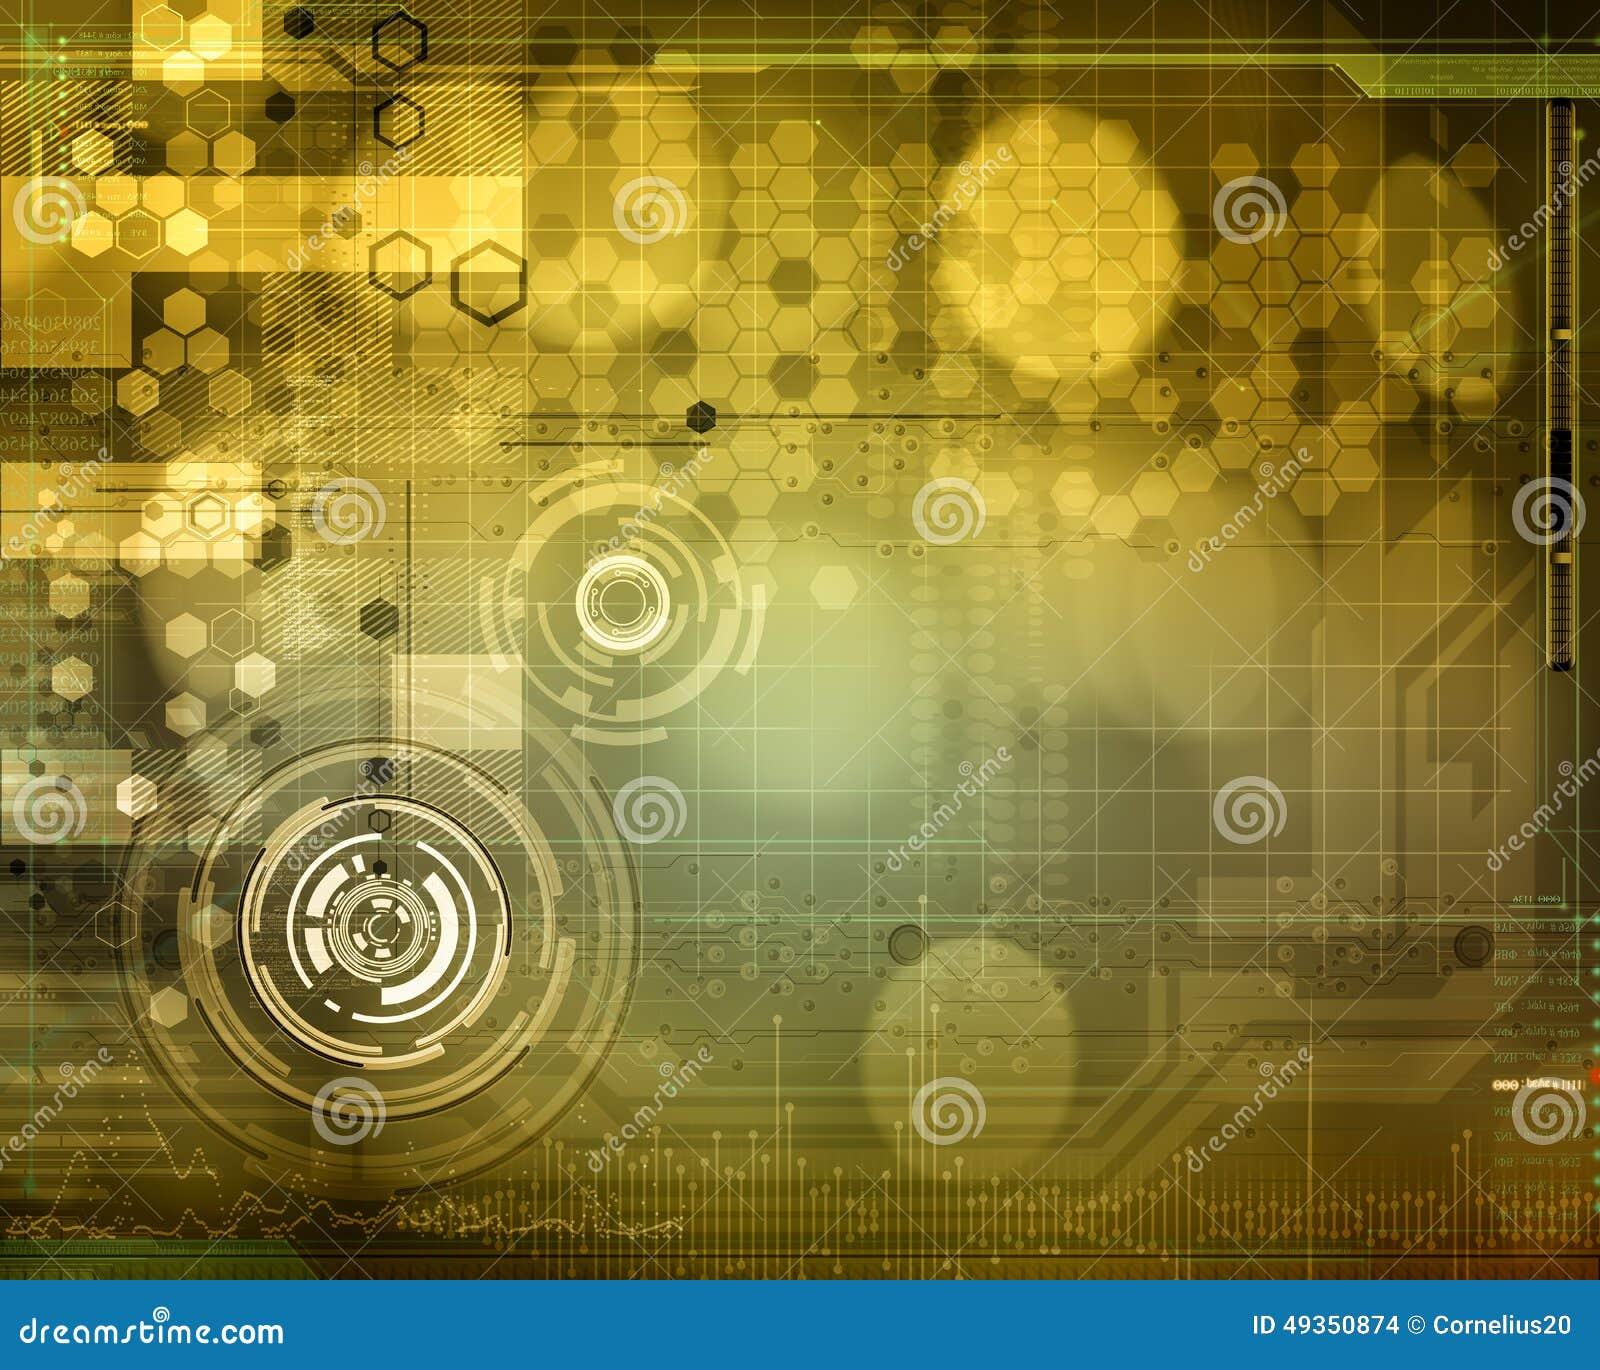 Abstract Tech Design Stock Illustration  Illustration Of